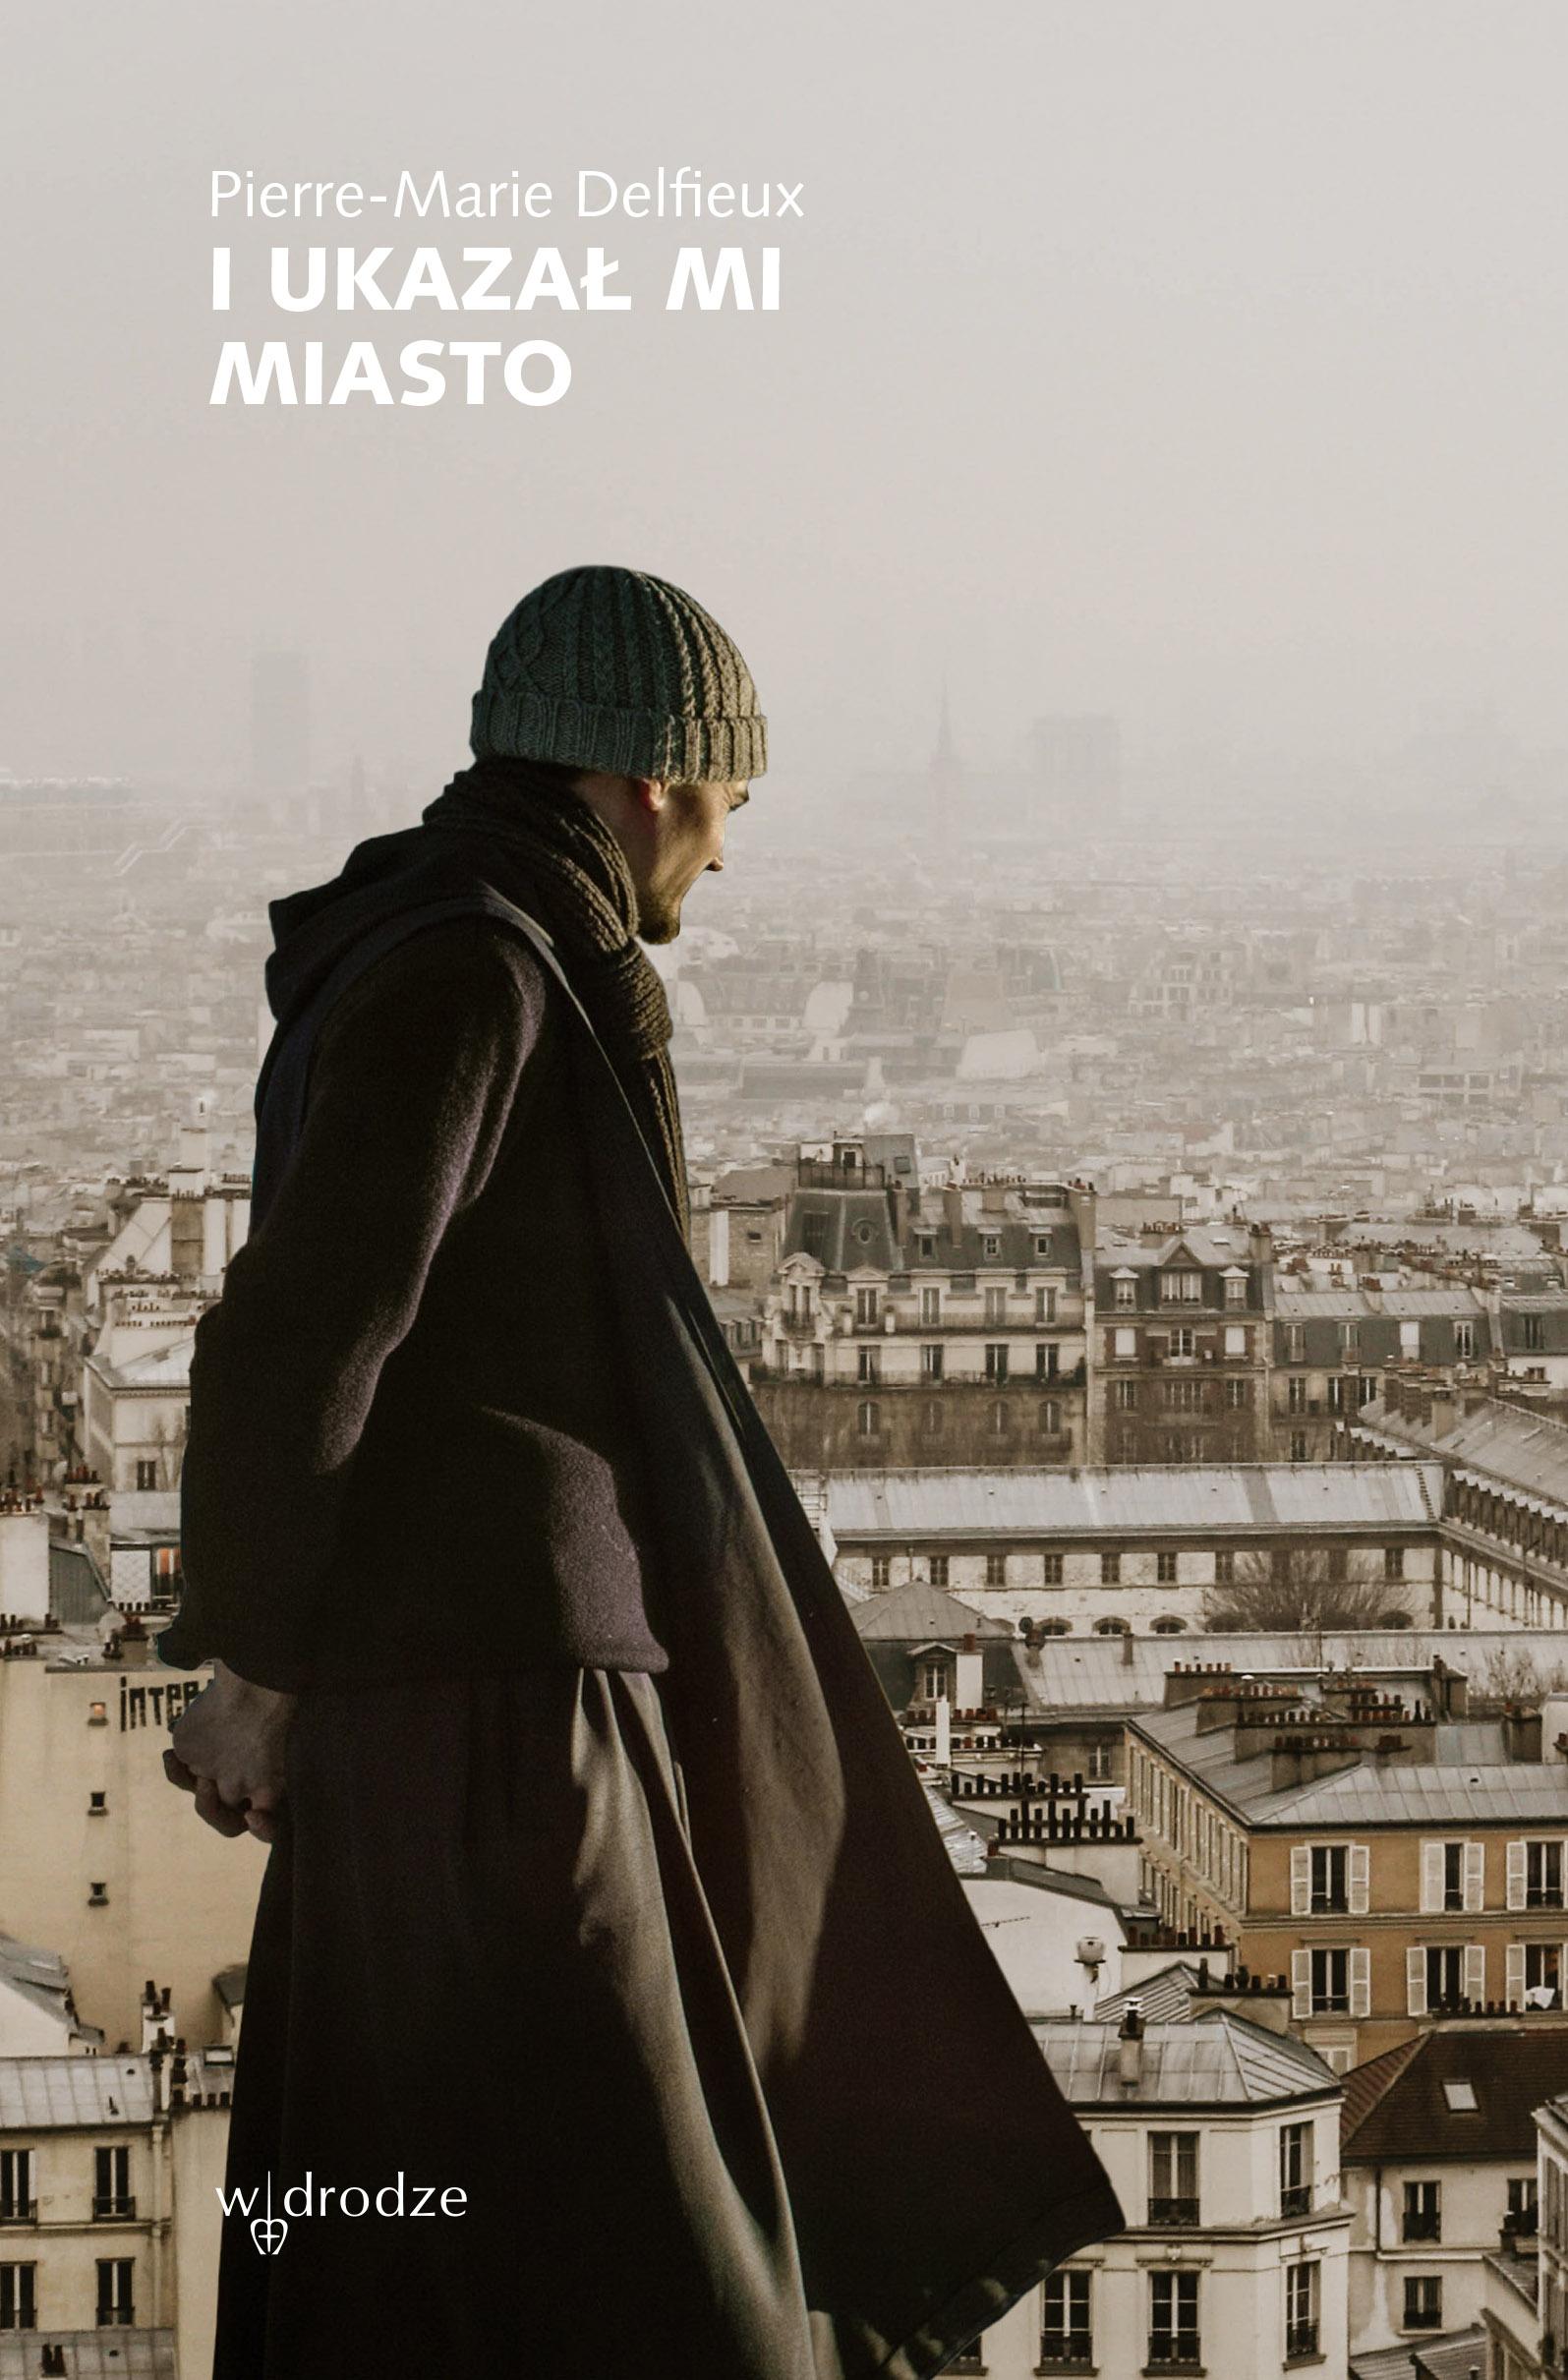 I ukazał mi miasto, Pierre-Marie Delfieux